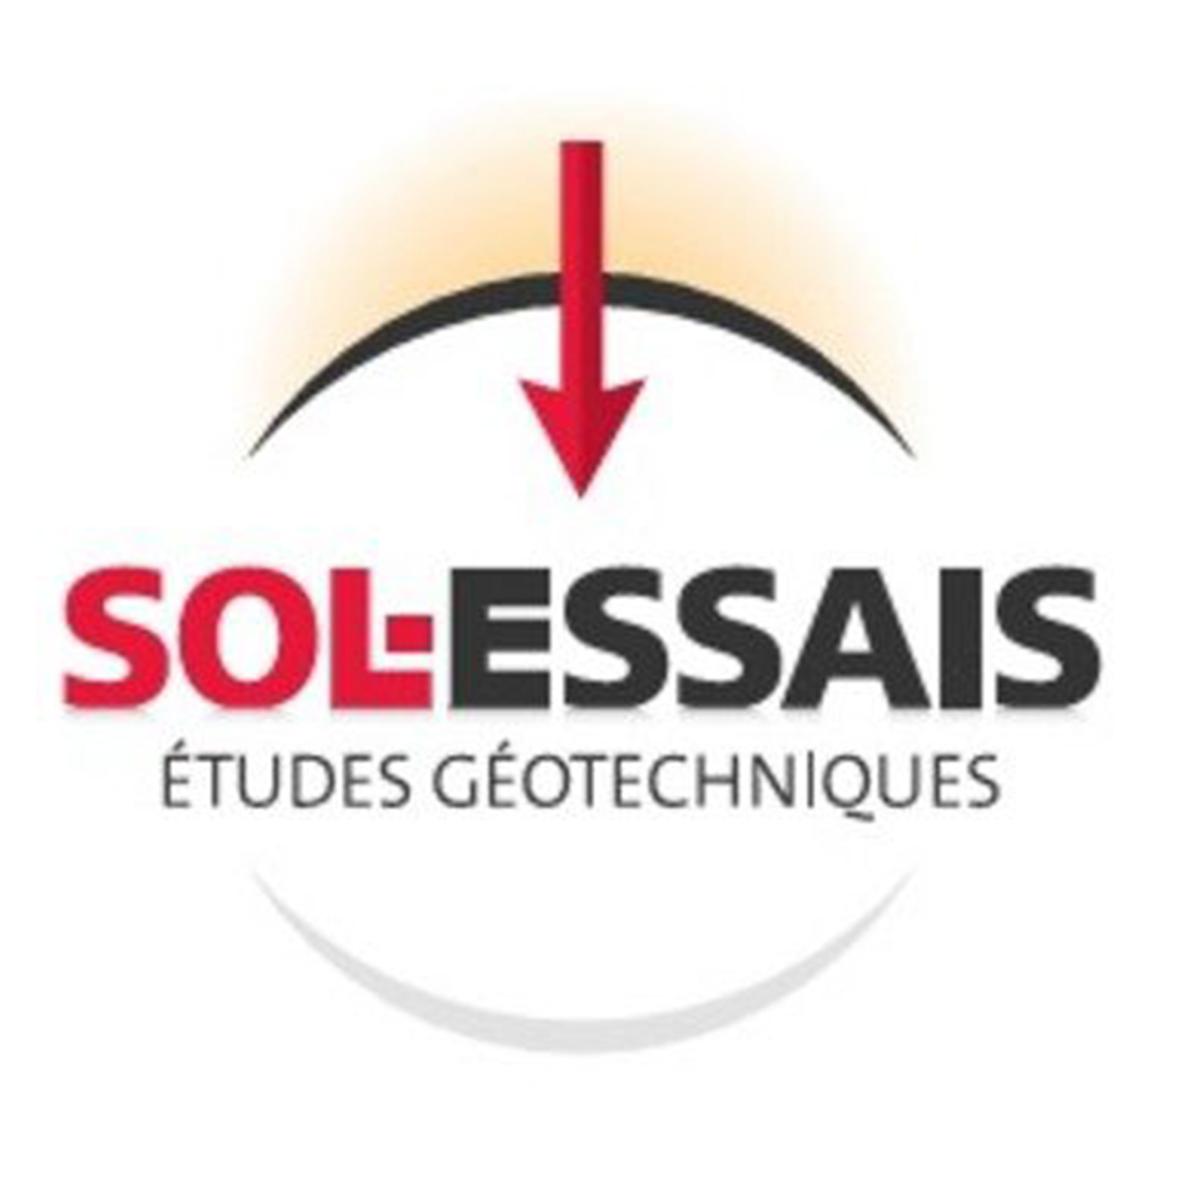 Sols-Essais investigations